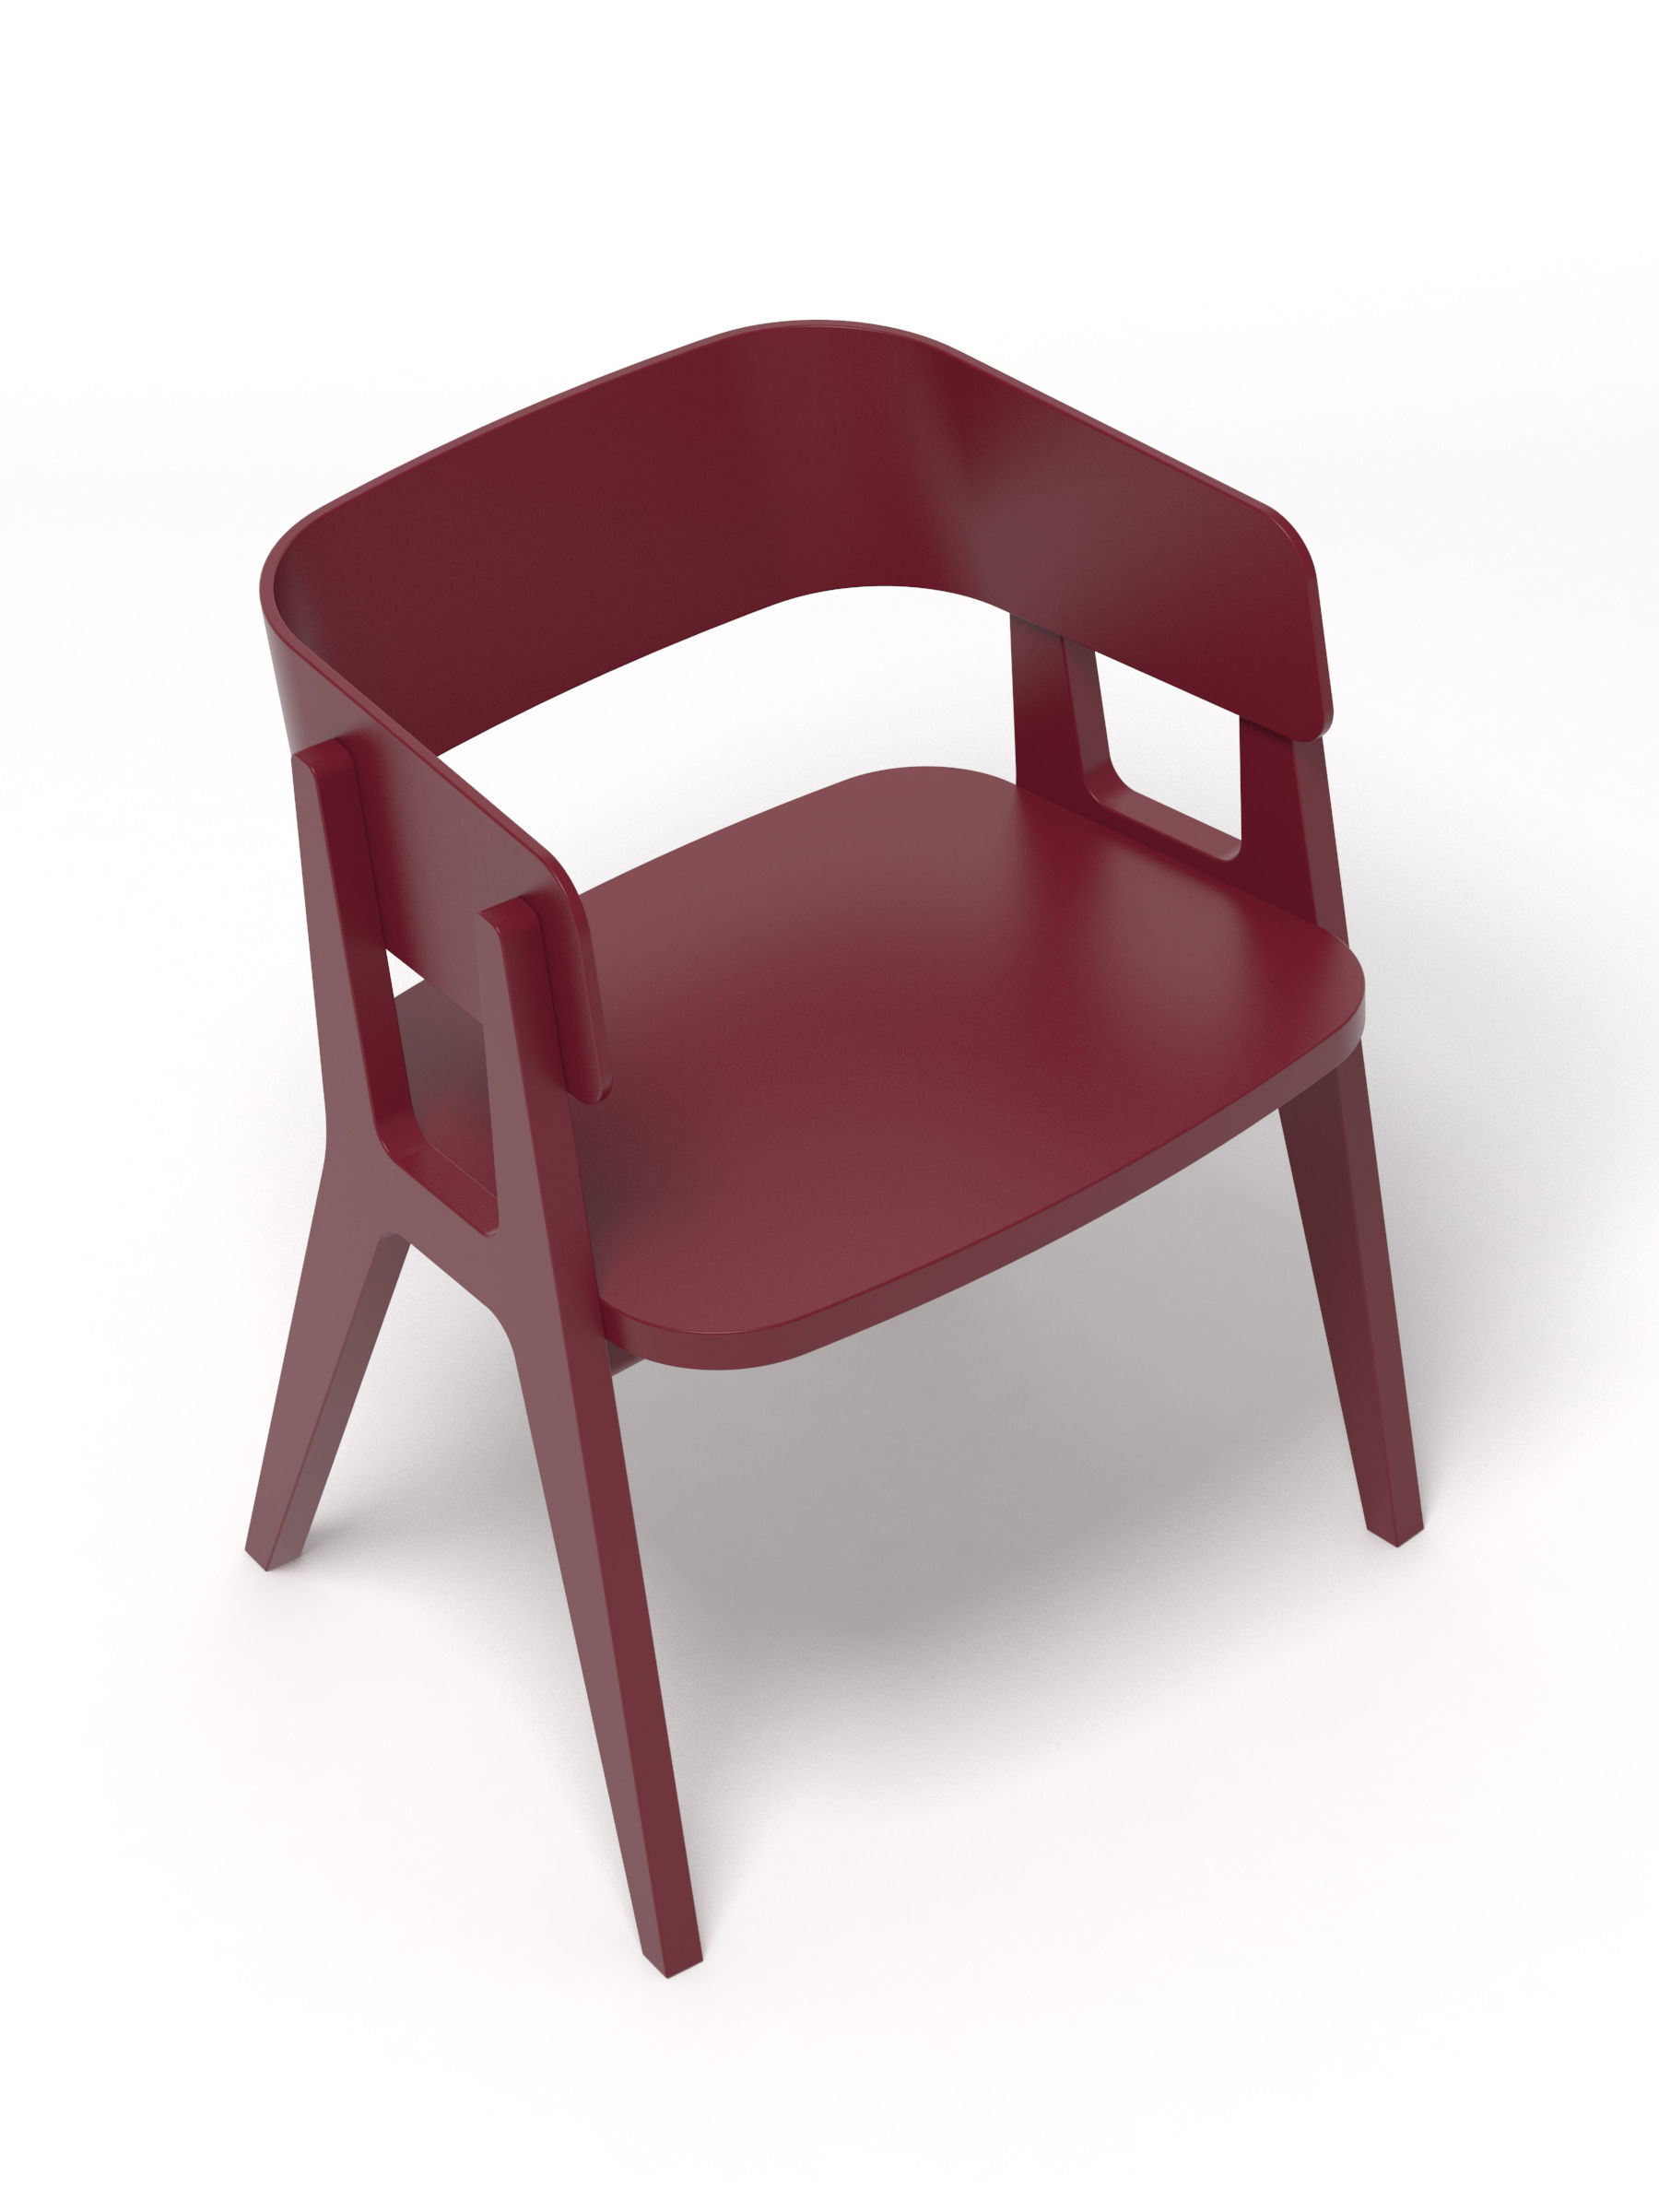 fauteuil henri bois bordeaux made in design editions. Black Bedroom Furniture Sets. Home Design Ideas